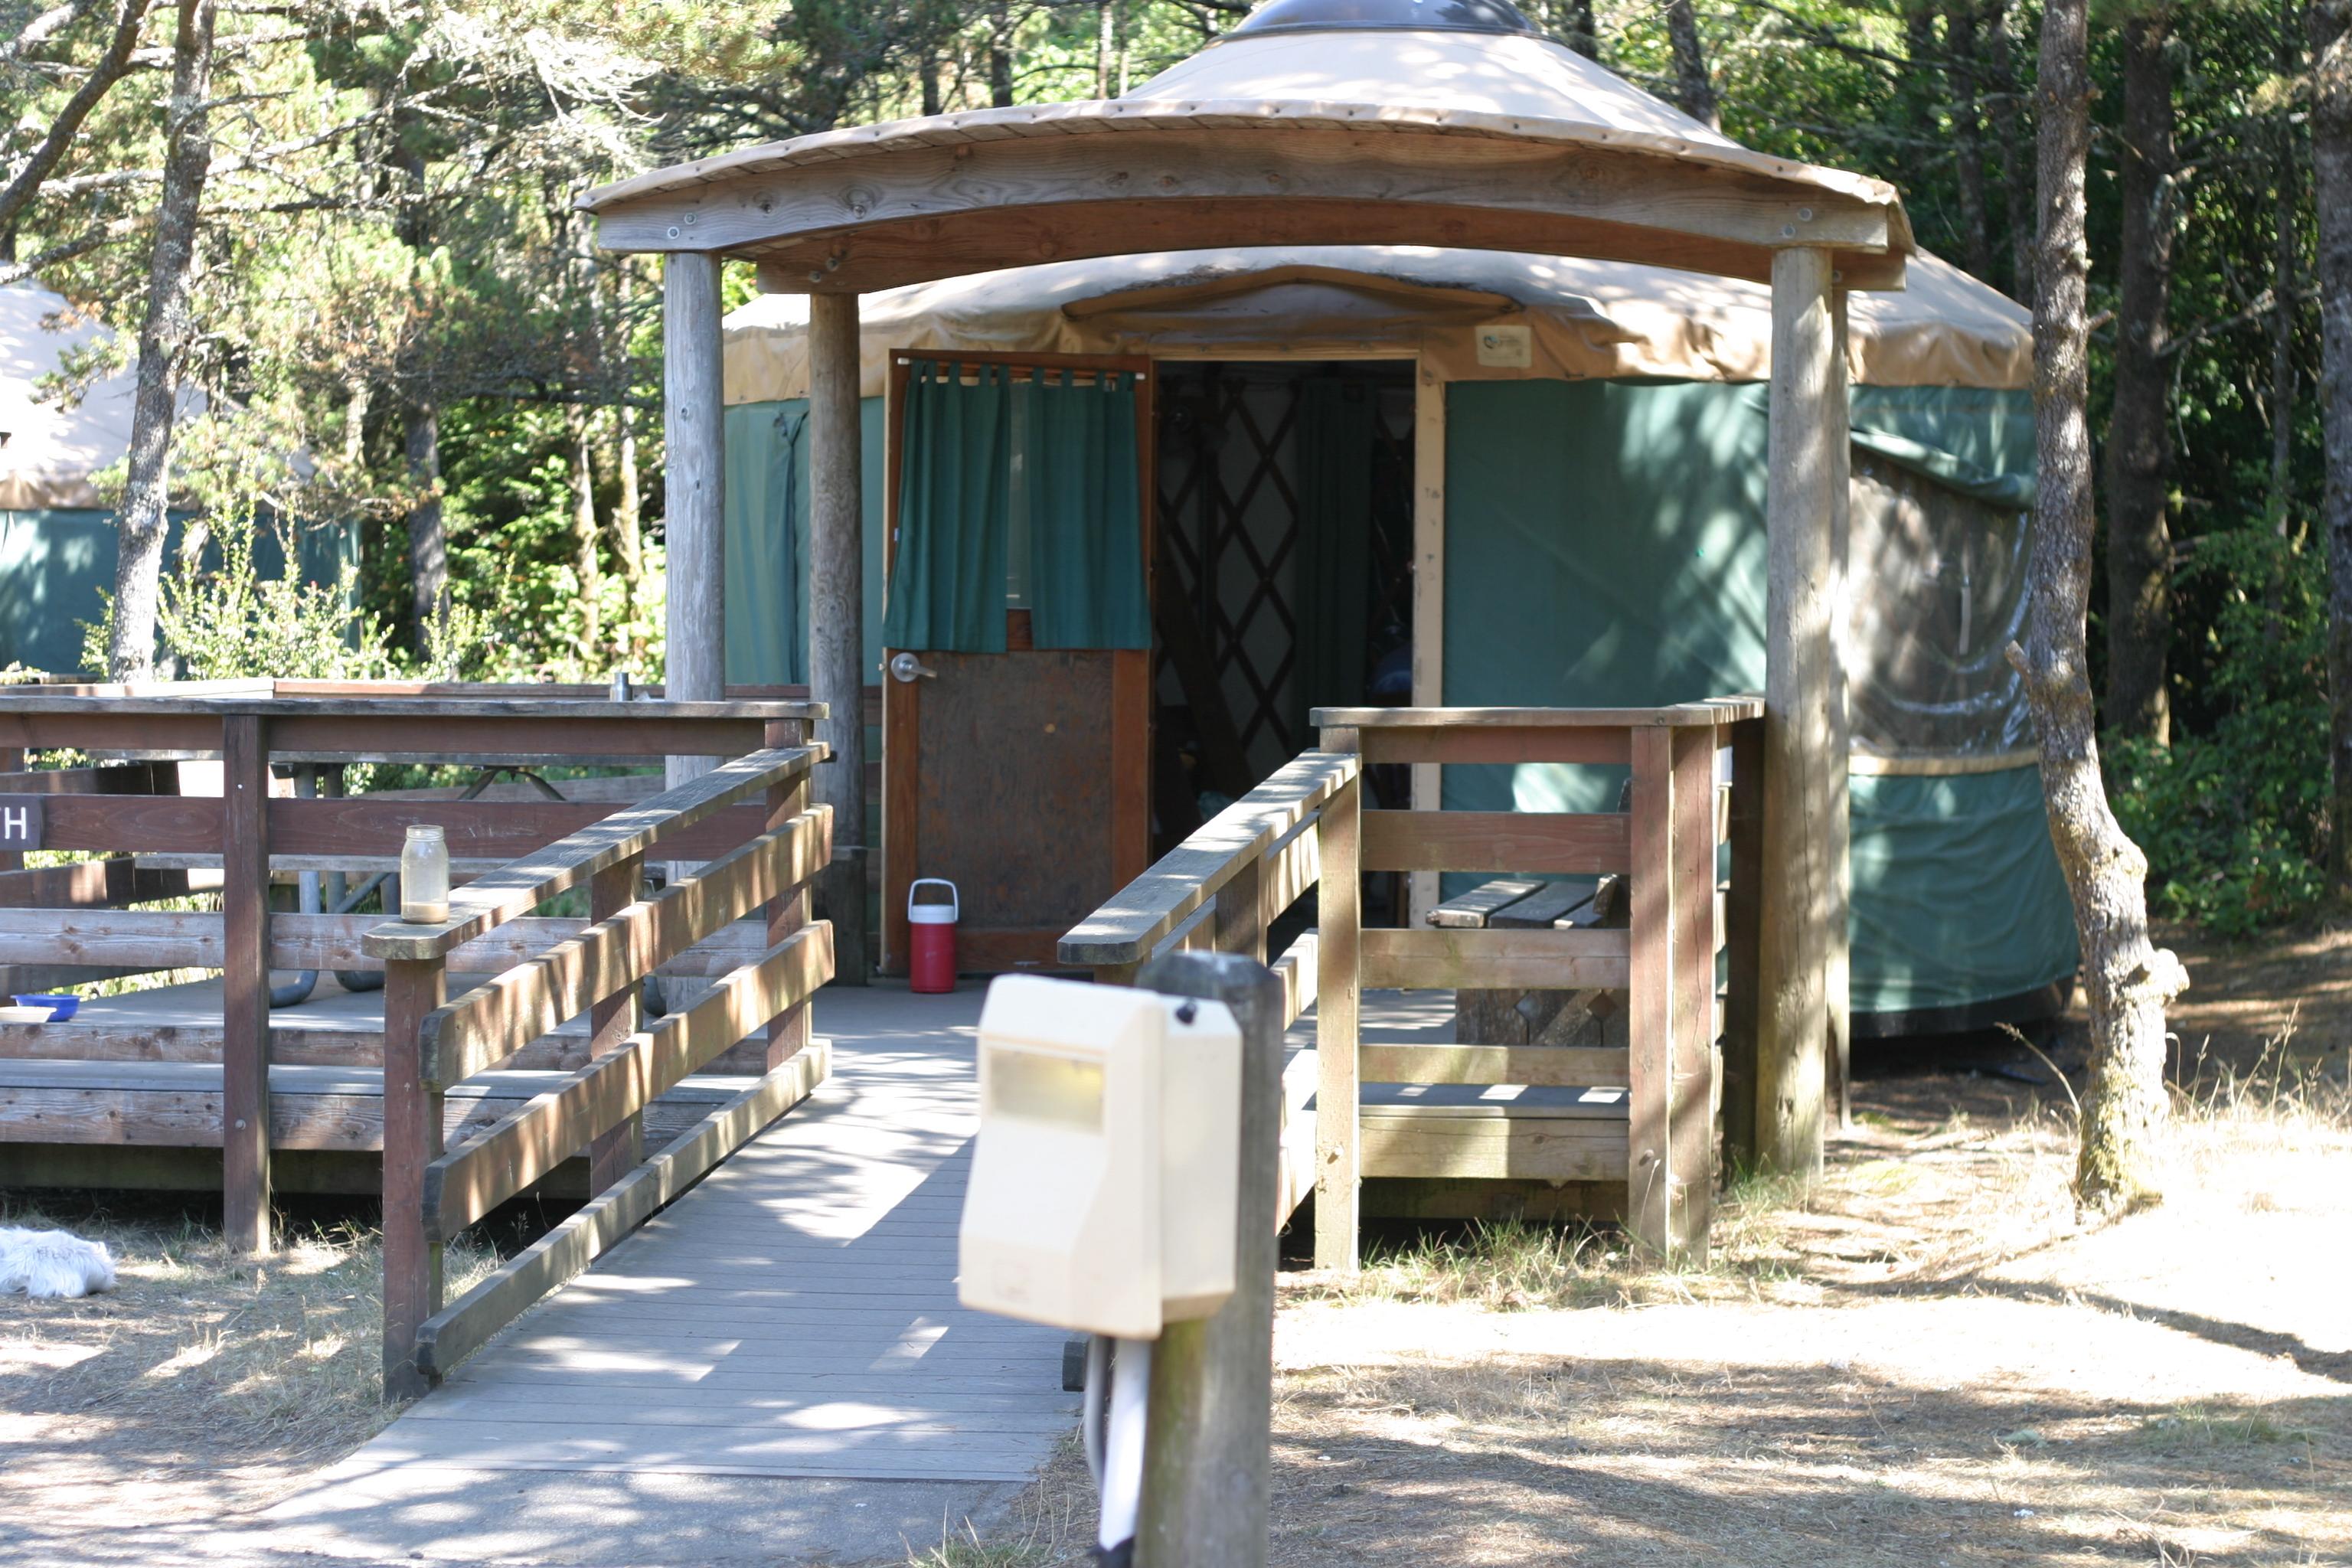 South Beach State Park Oregon Francois5